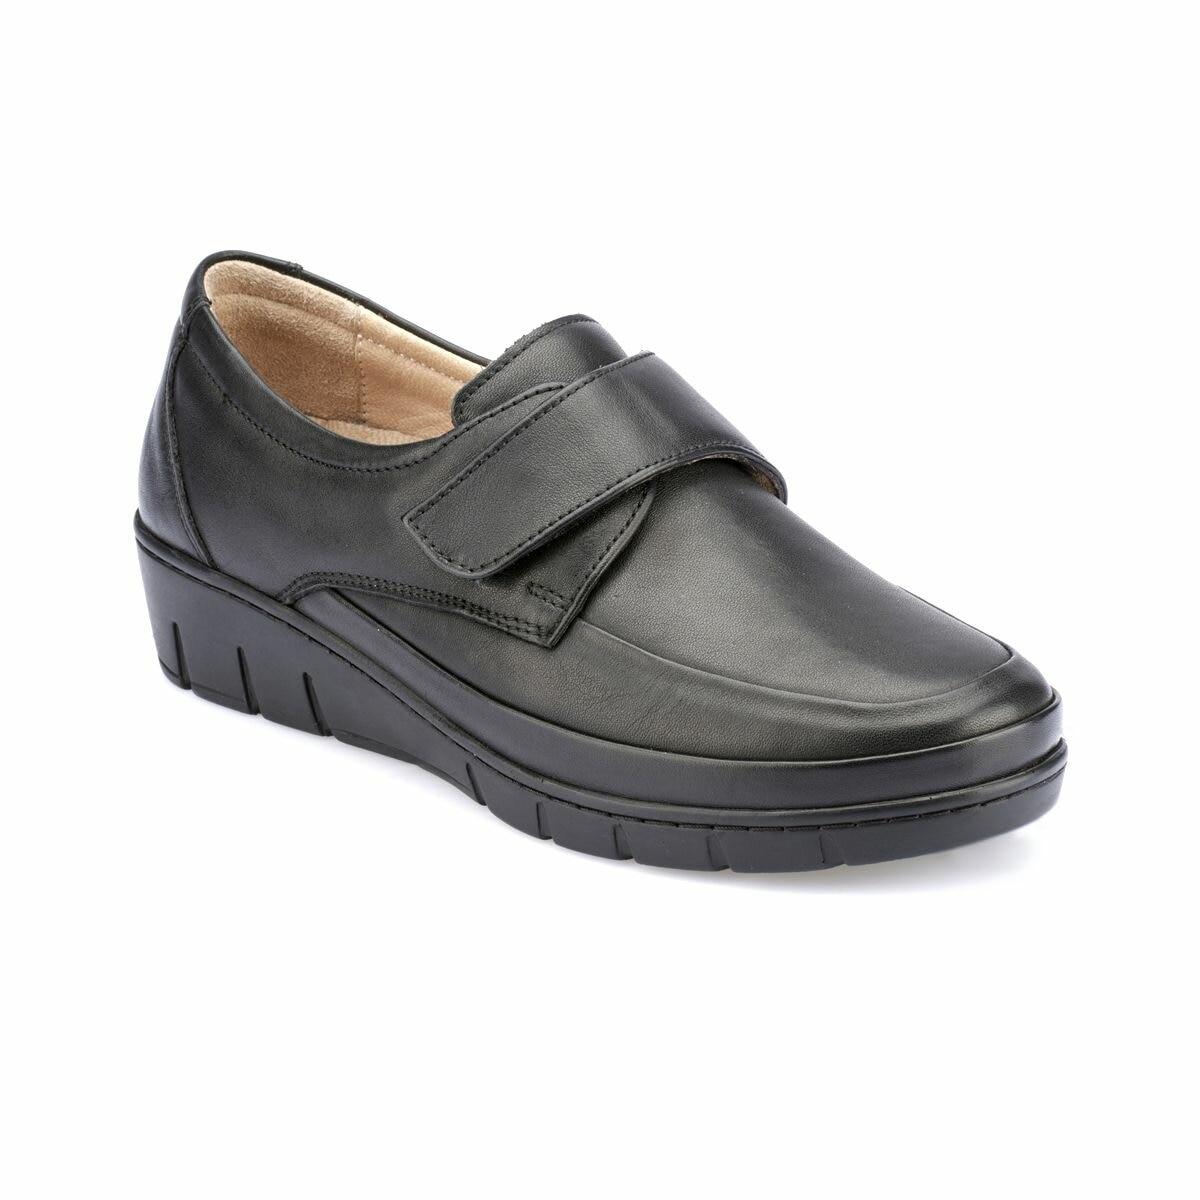 FLO 82.110003.Z Black Women Shoes Polaris 5 Point